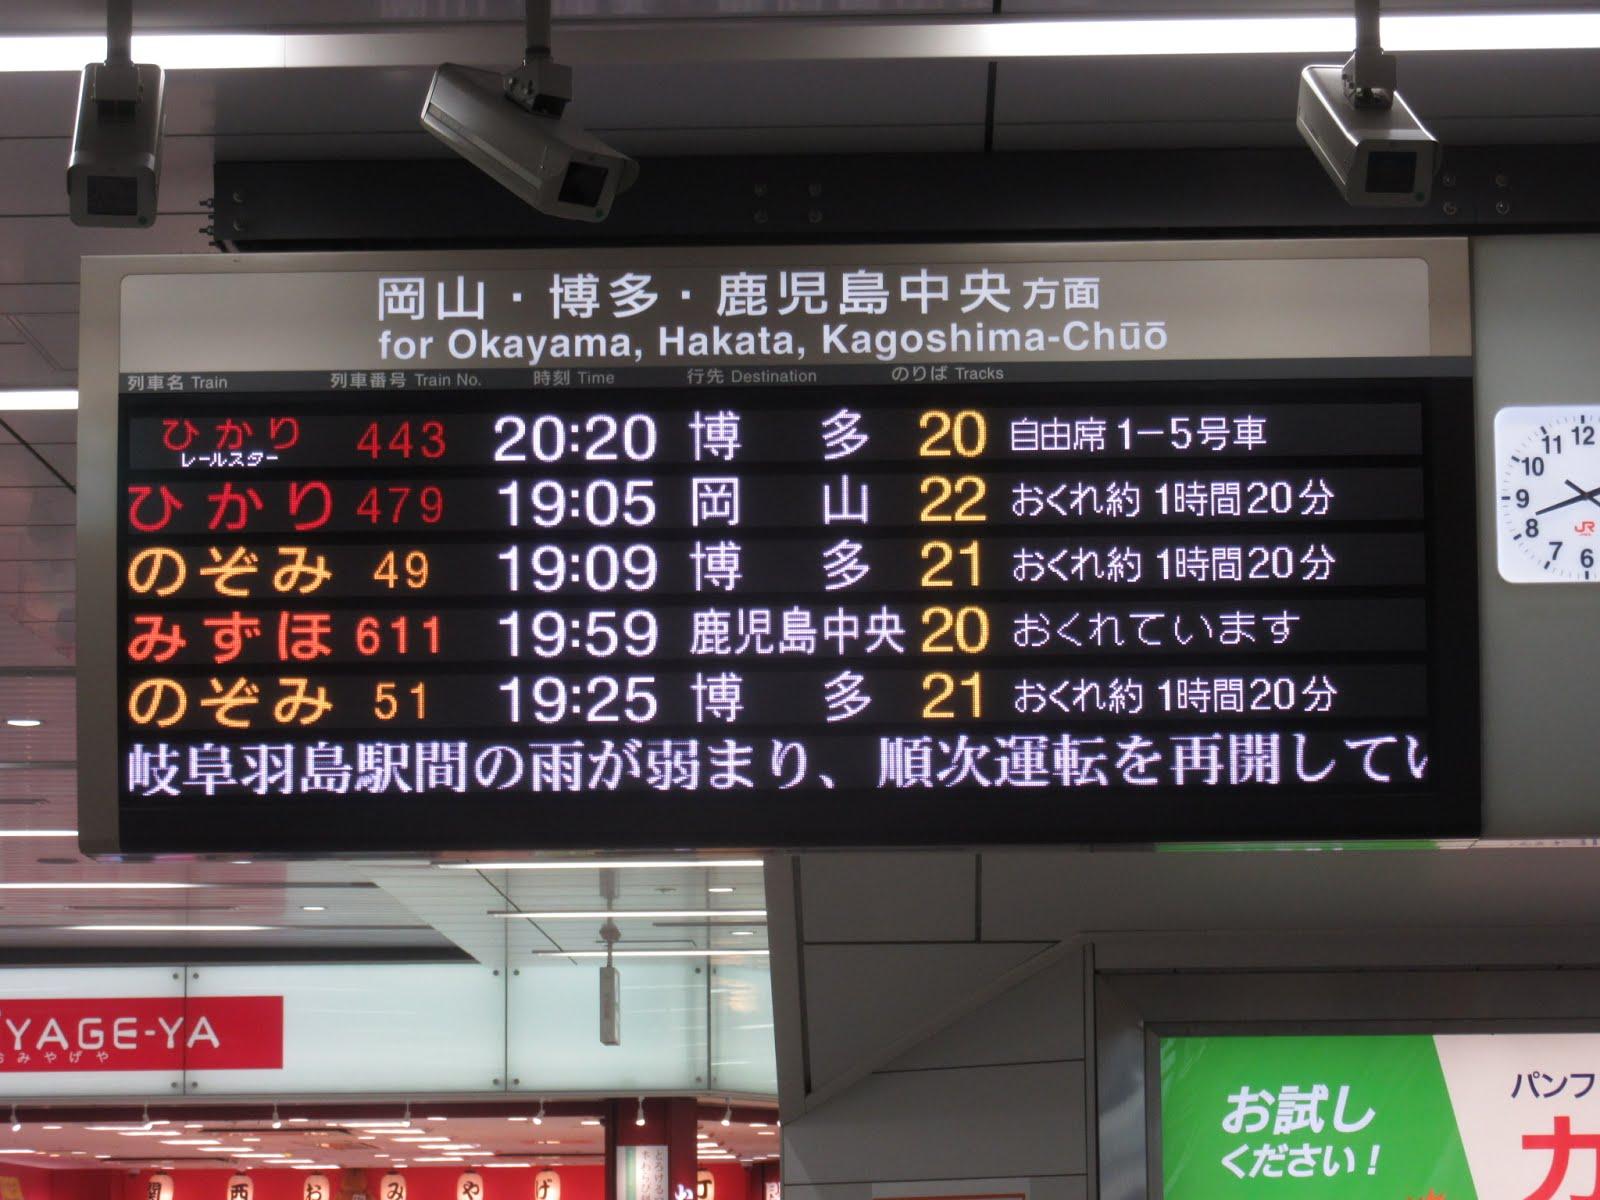 新幹線 遅れ 東海道